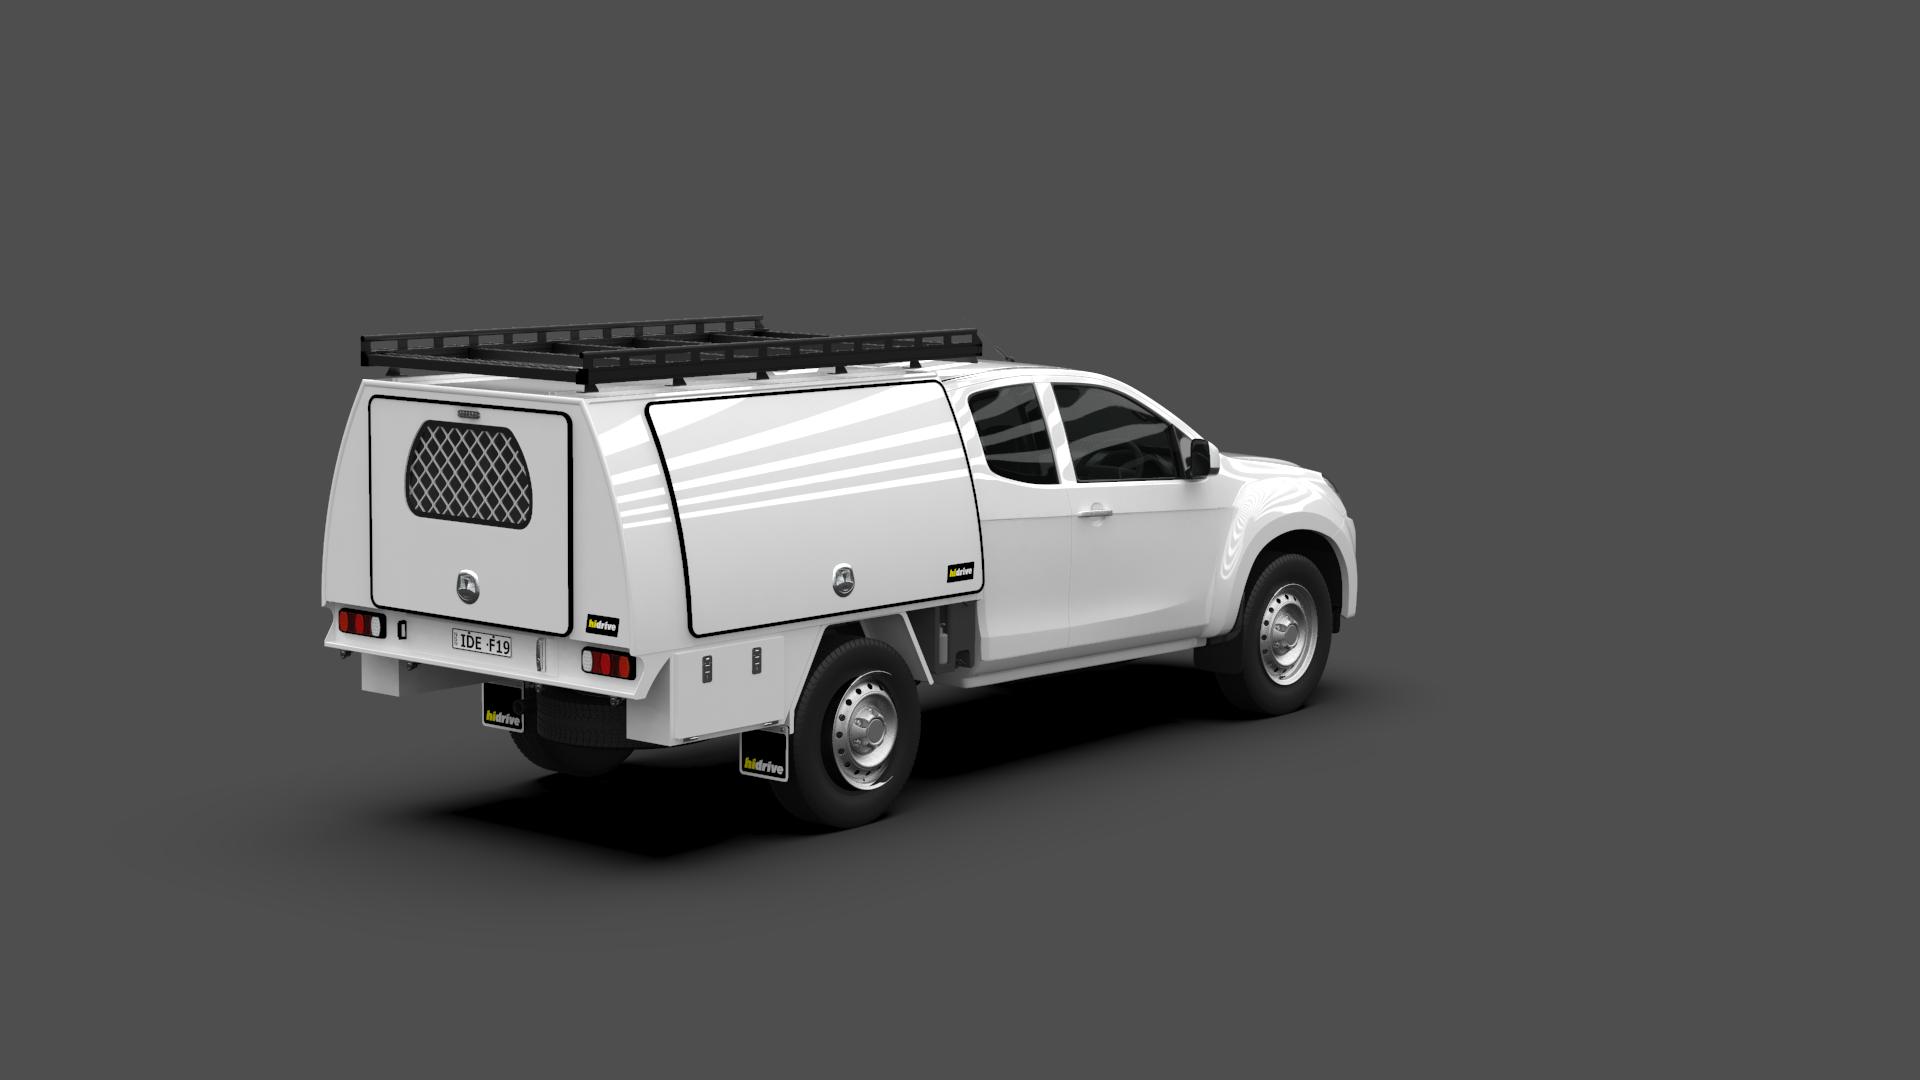 Isuzu D-Max Space Cab Full Canopy